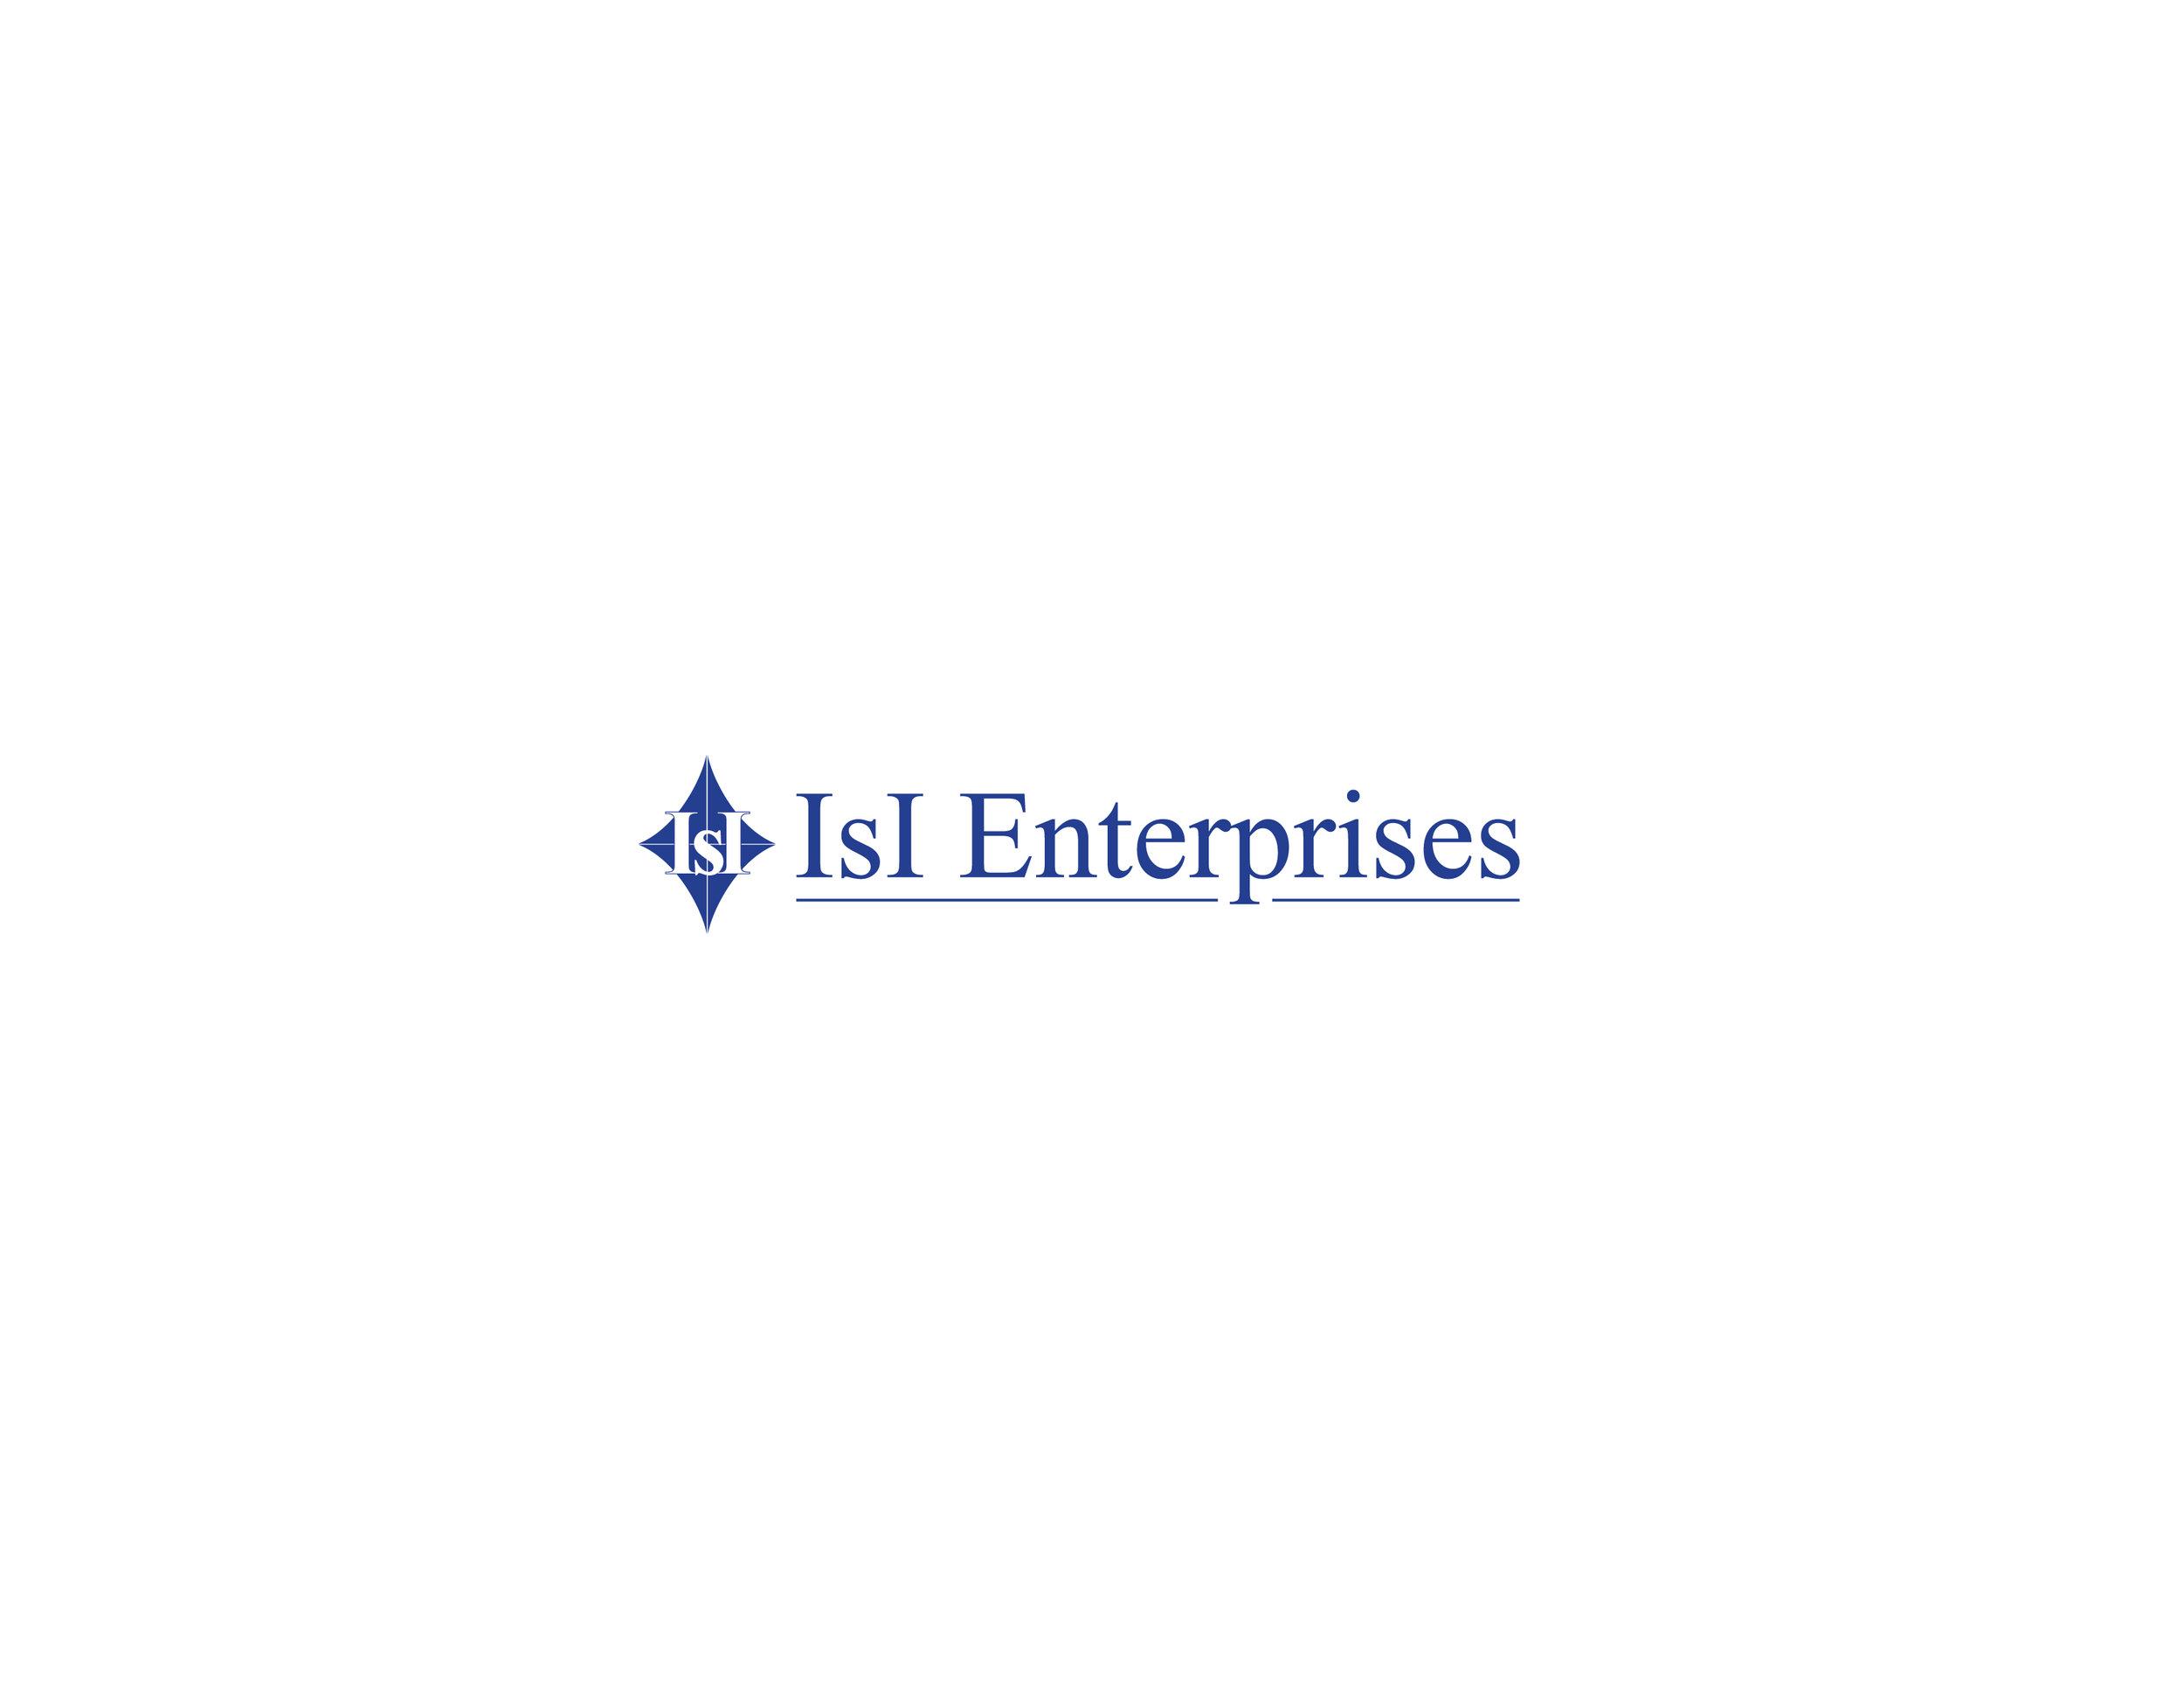 ISI Enterprises-Web-2.jpg